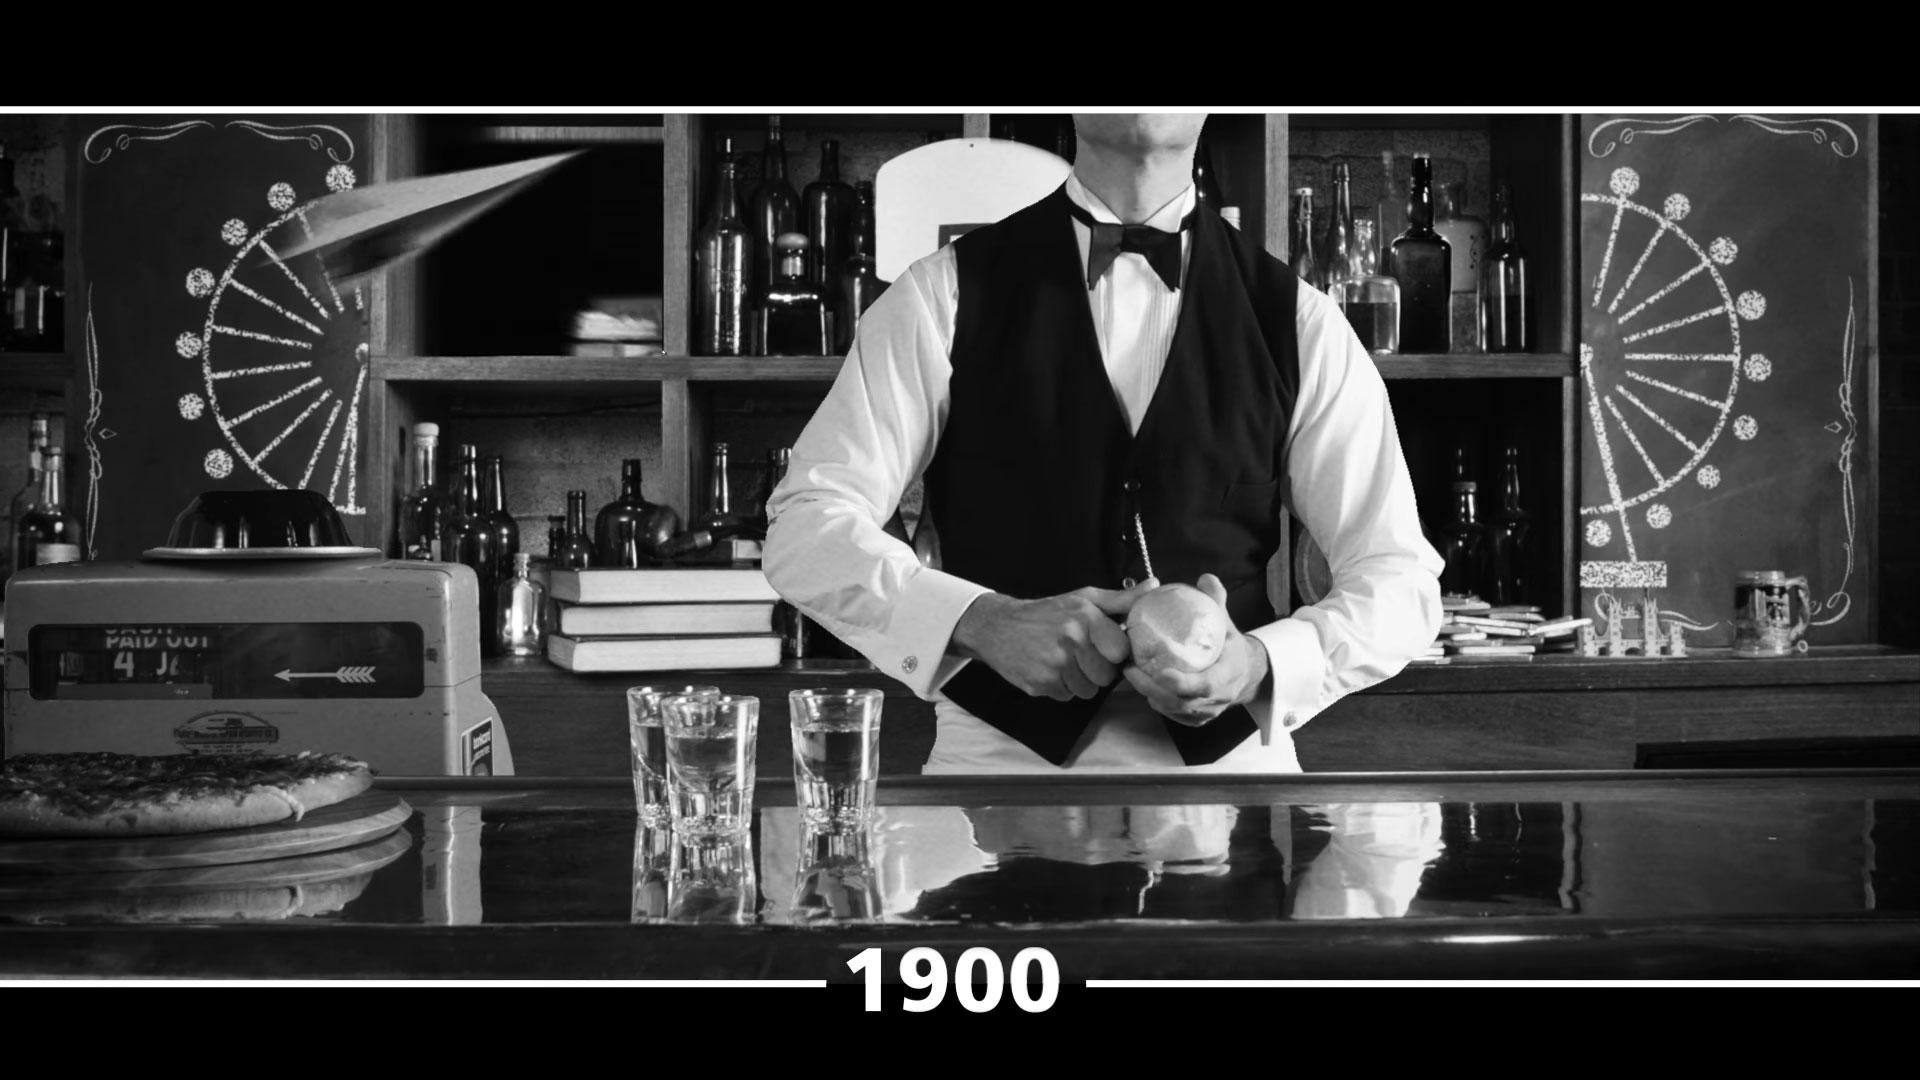 Jack Daniels 1900